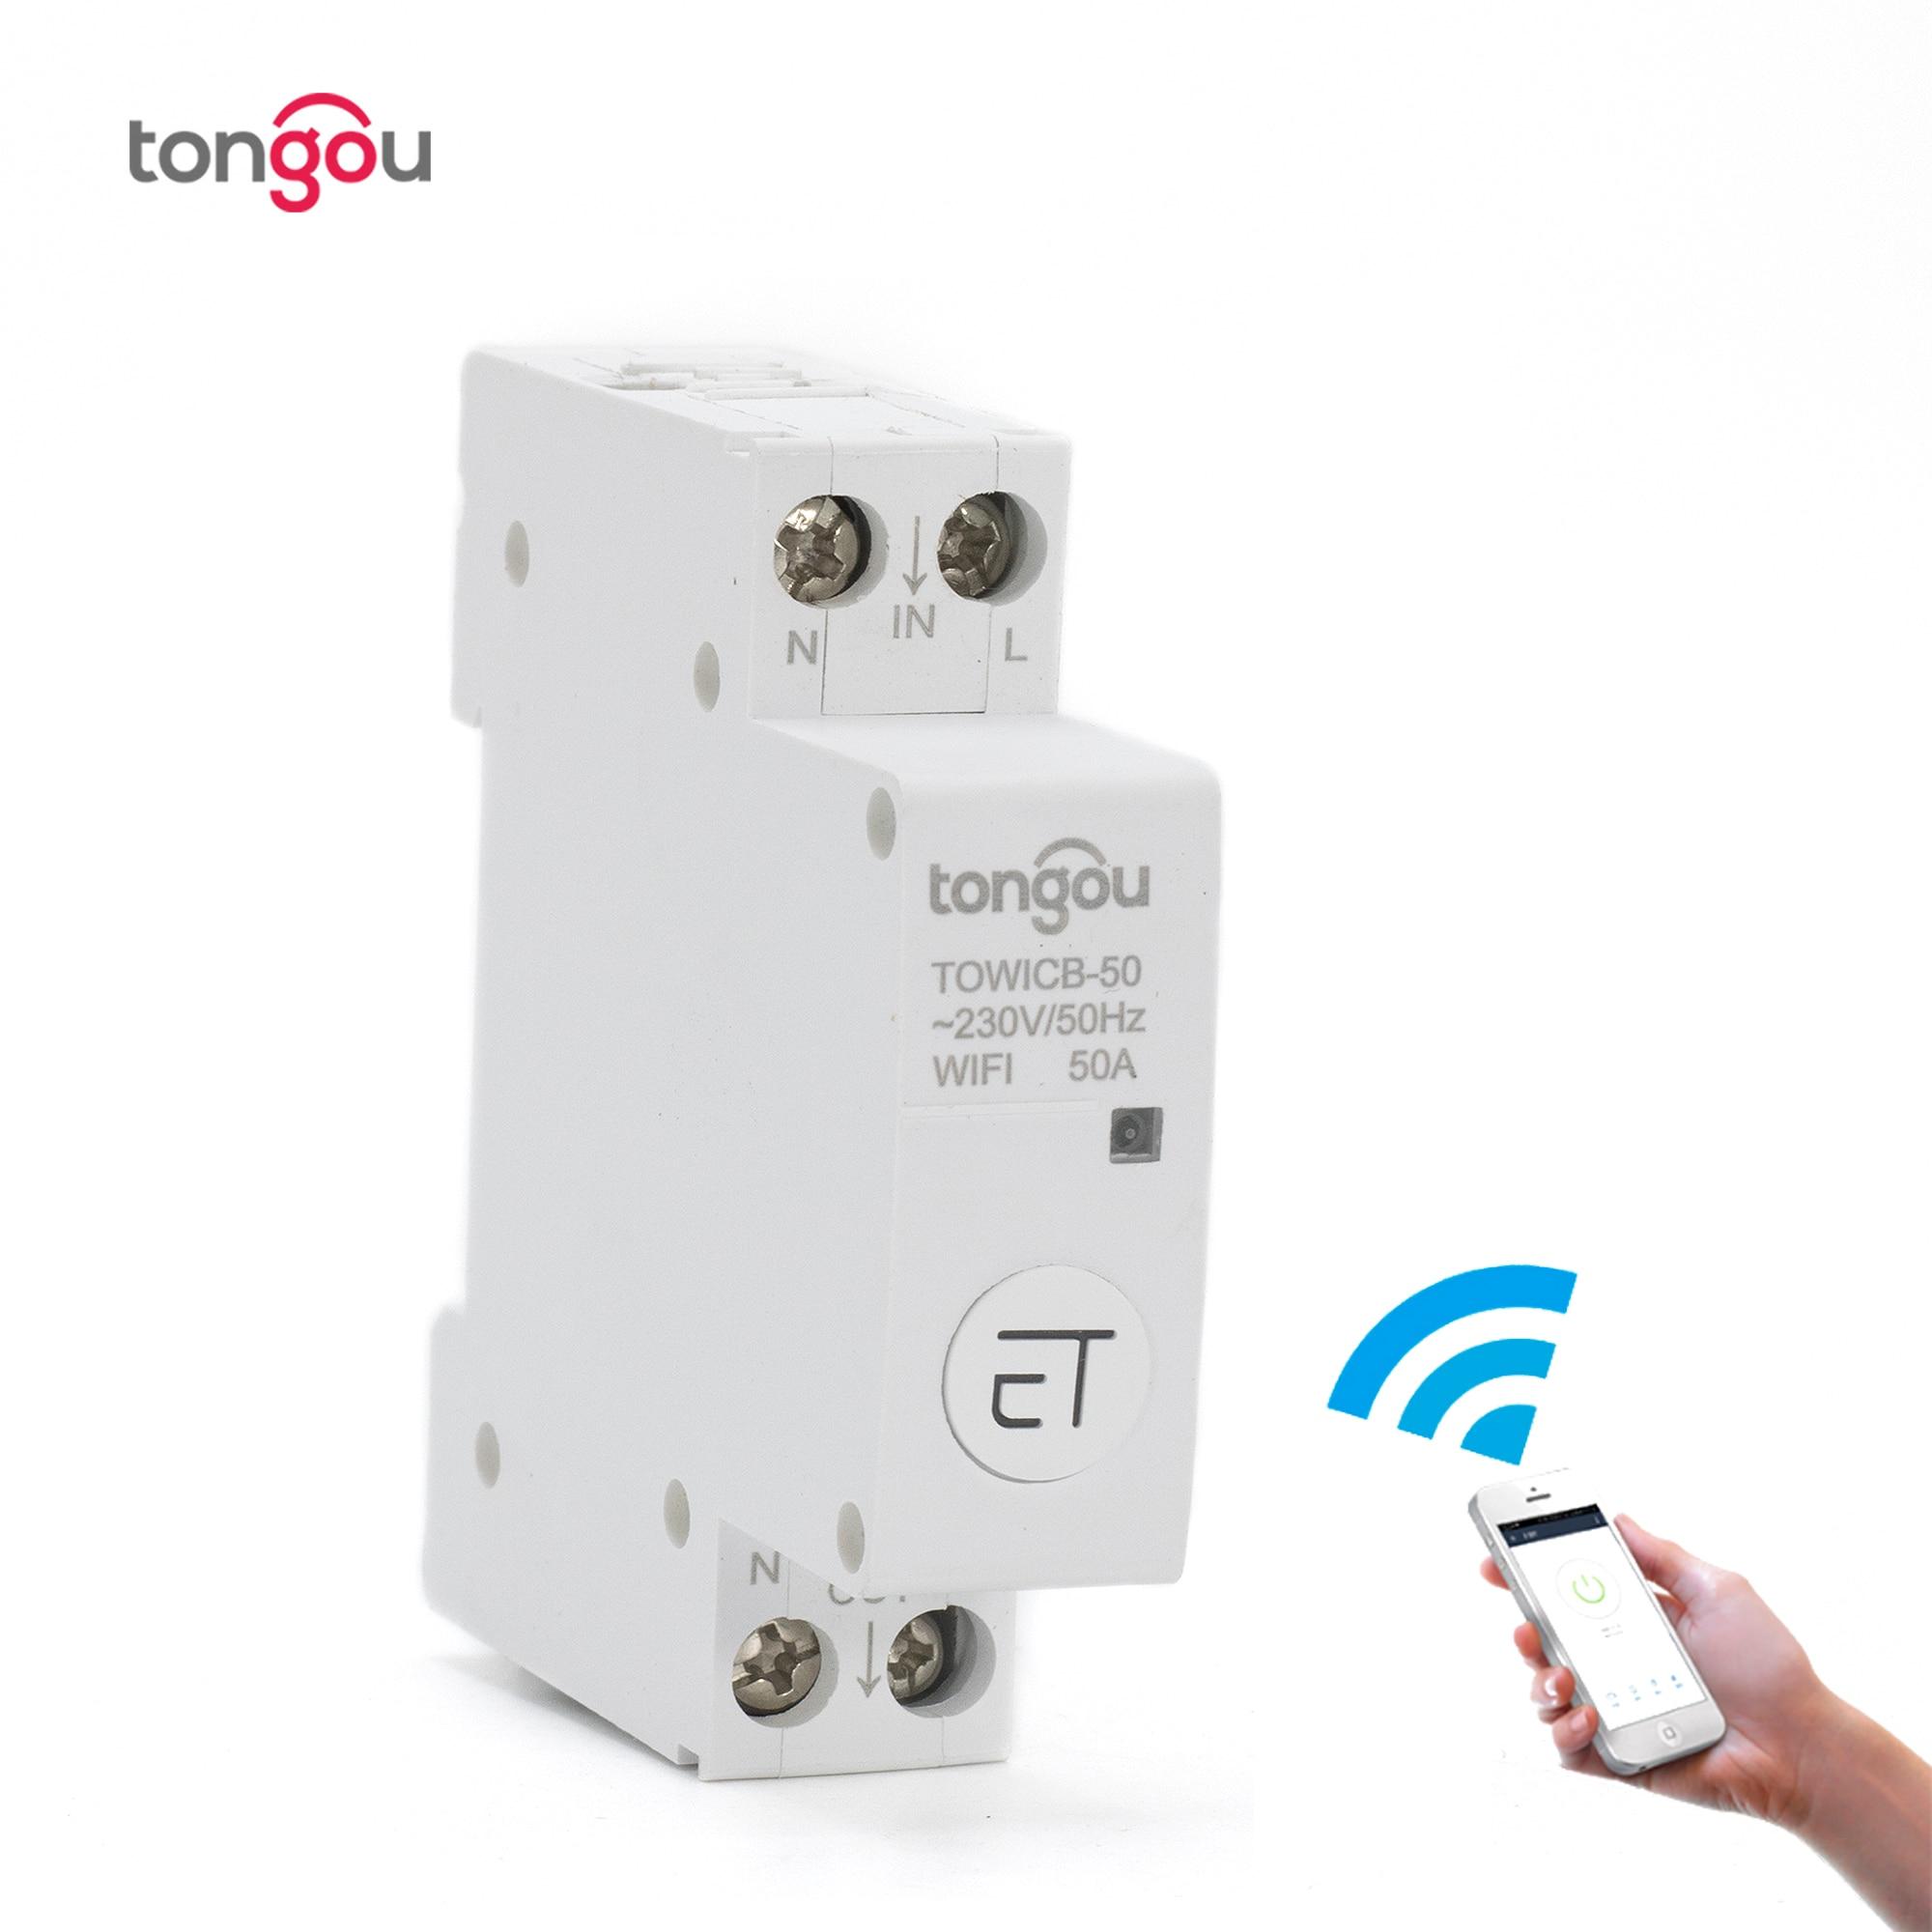 Interruptor de circuito WiFi Control remoto por eWeLink APP Control de voz con Amazon Alexa Google Home 18mm carril Din interruptor principal TONGOU